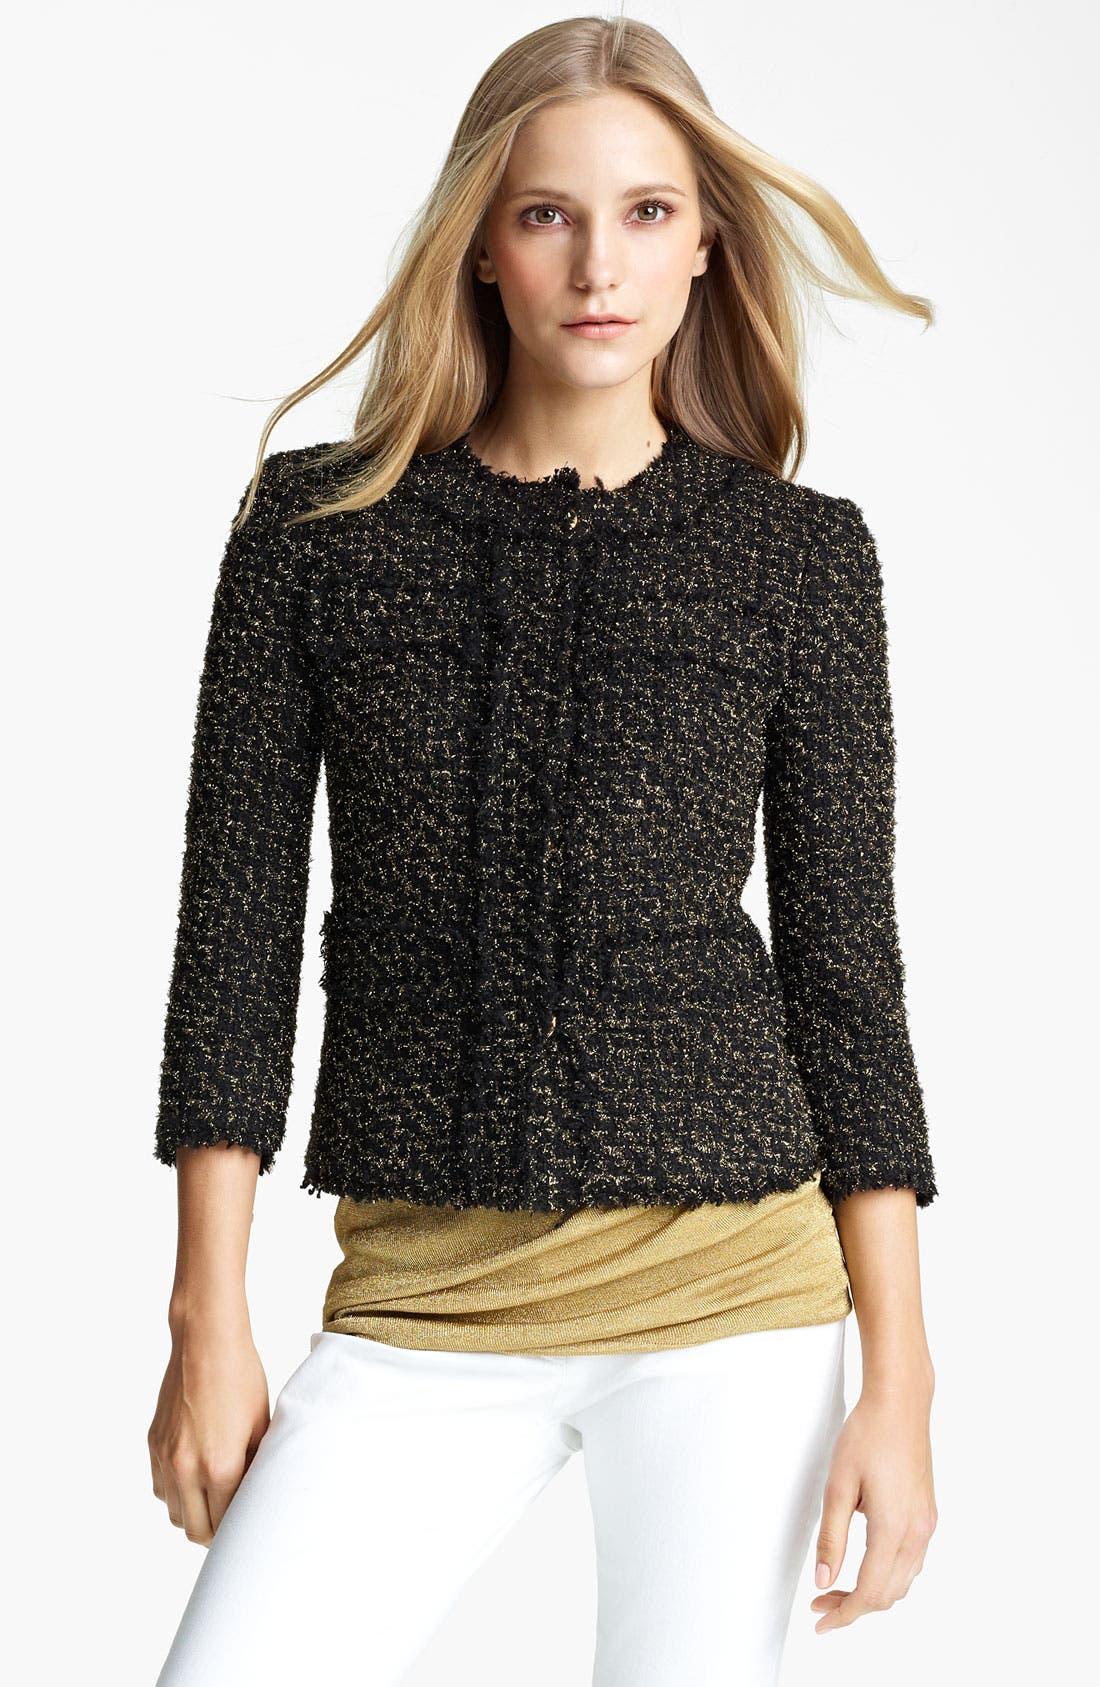 Main Image - Michael Kors Metallic Tweed Jacket